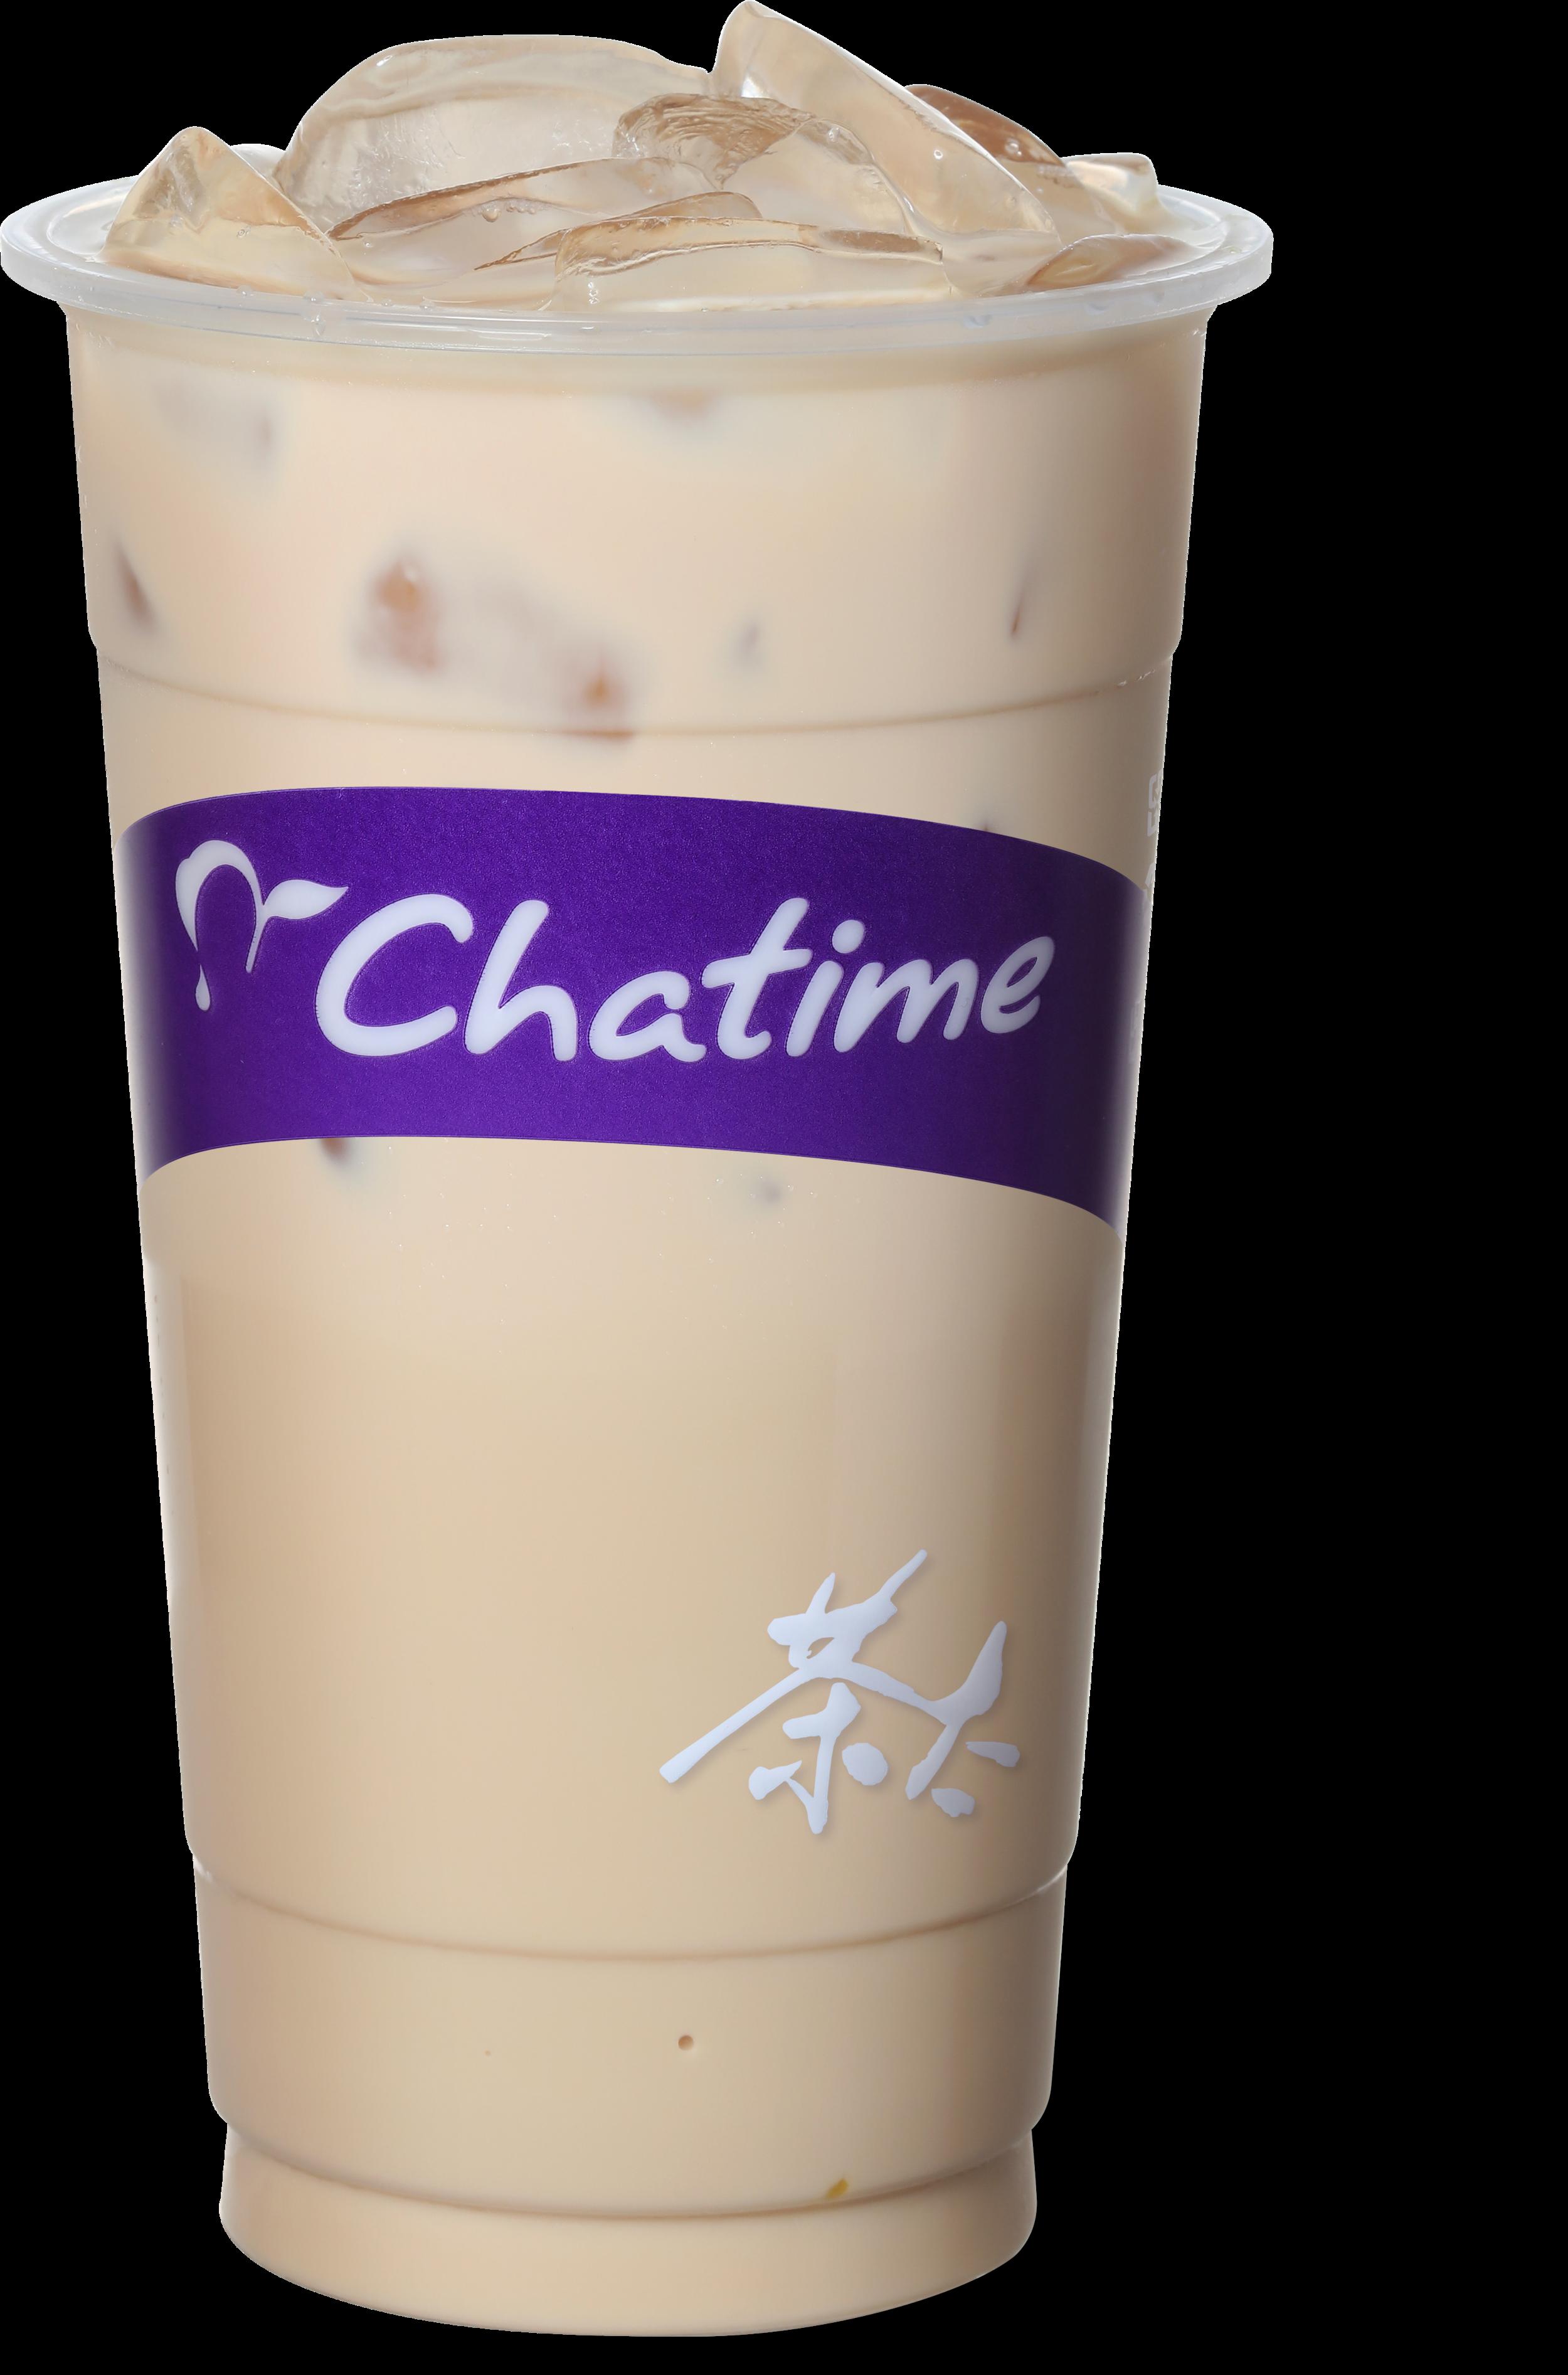 Chatime Maryland - chatime white marsh